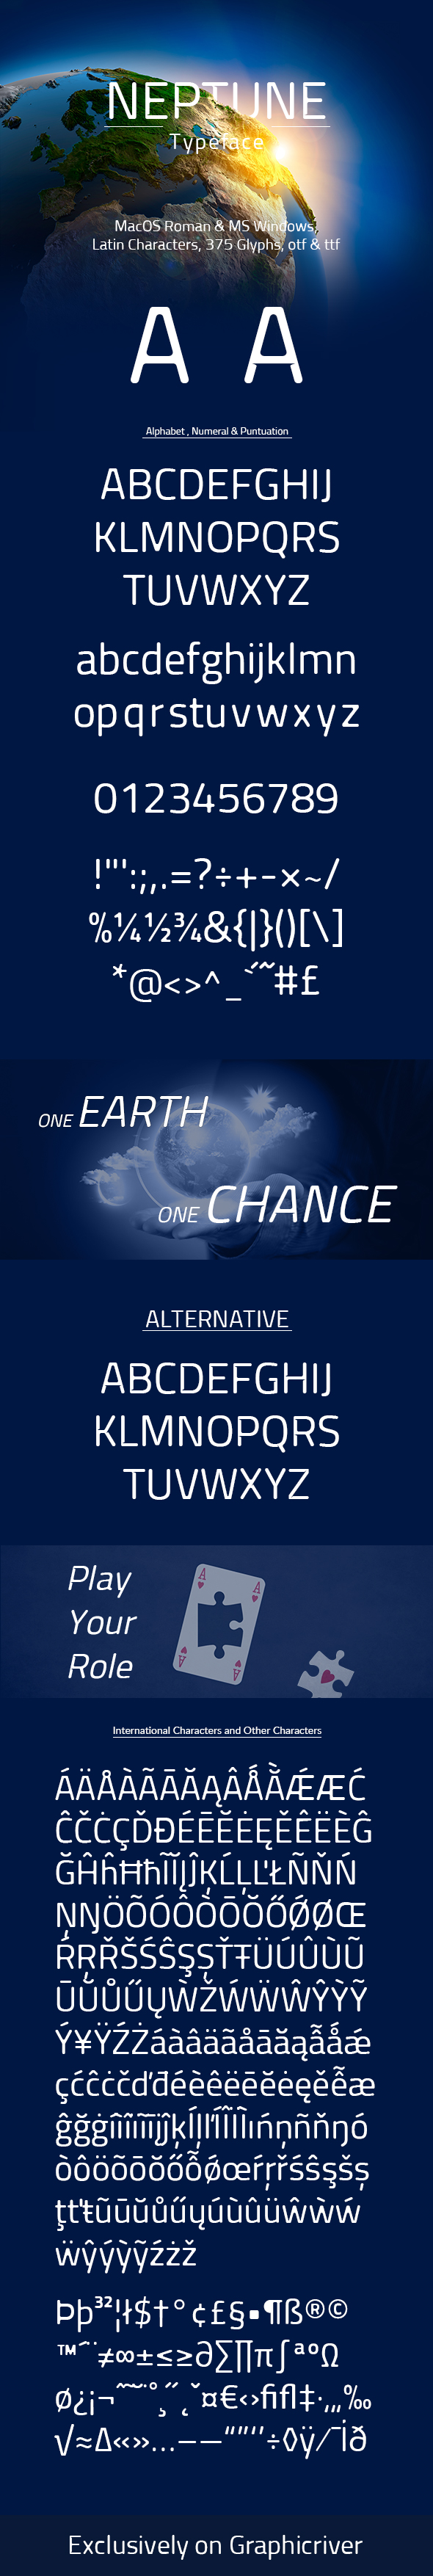 Neptune - Sans-Serif Fonts